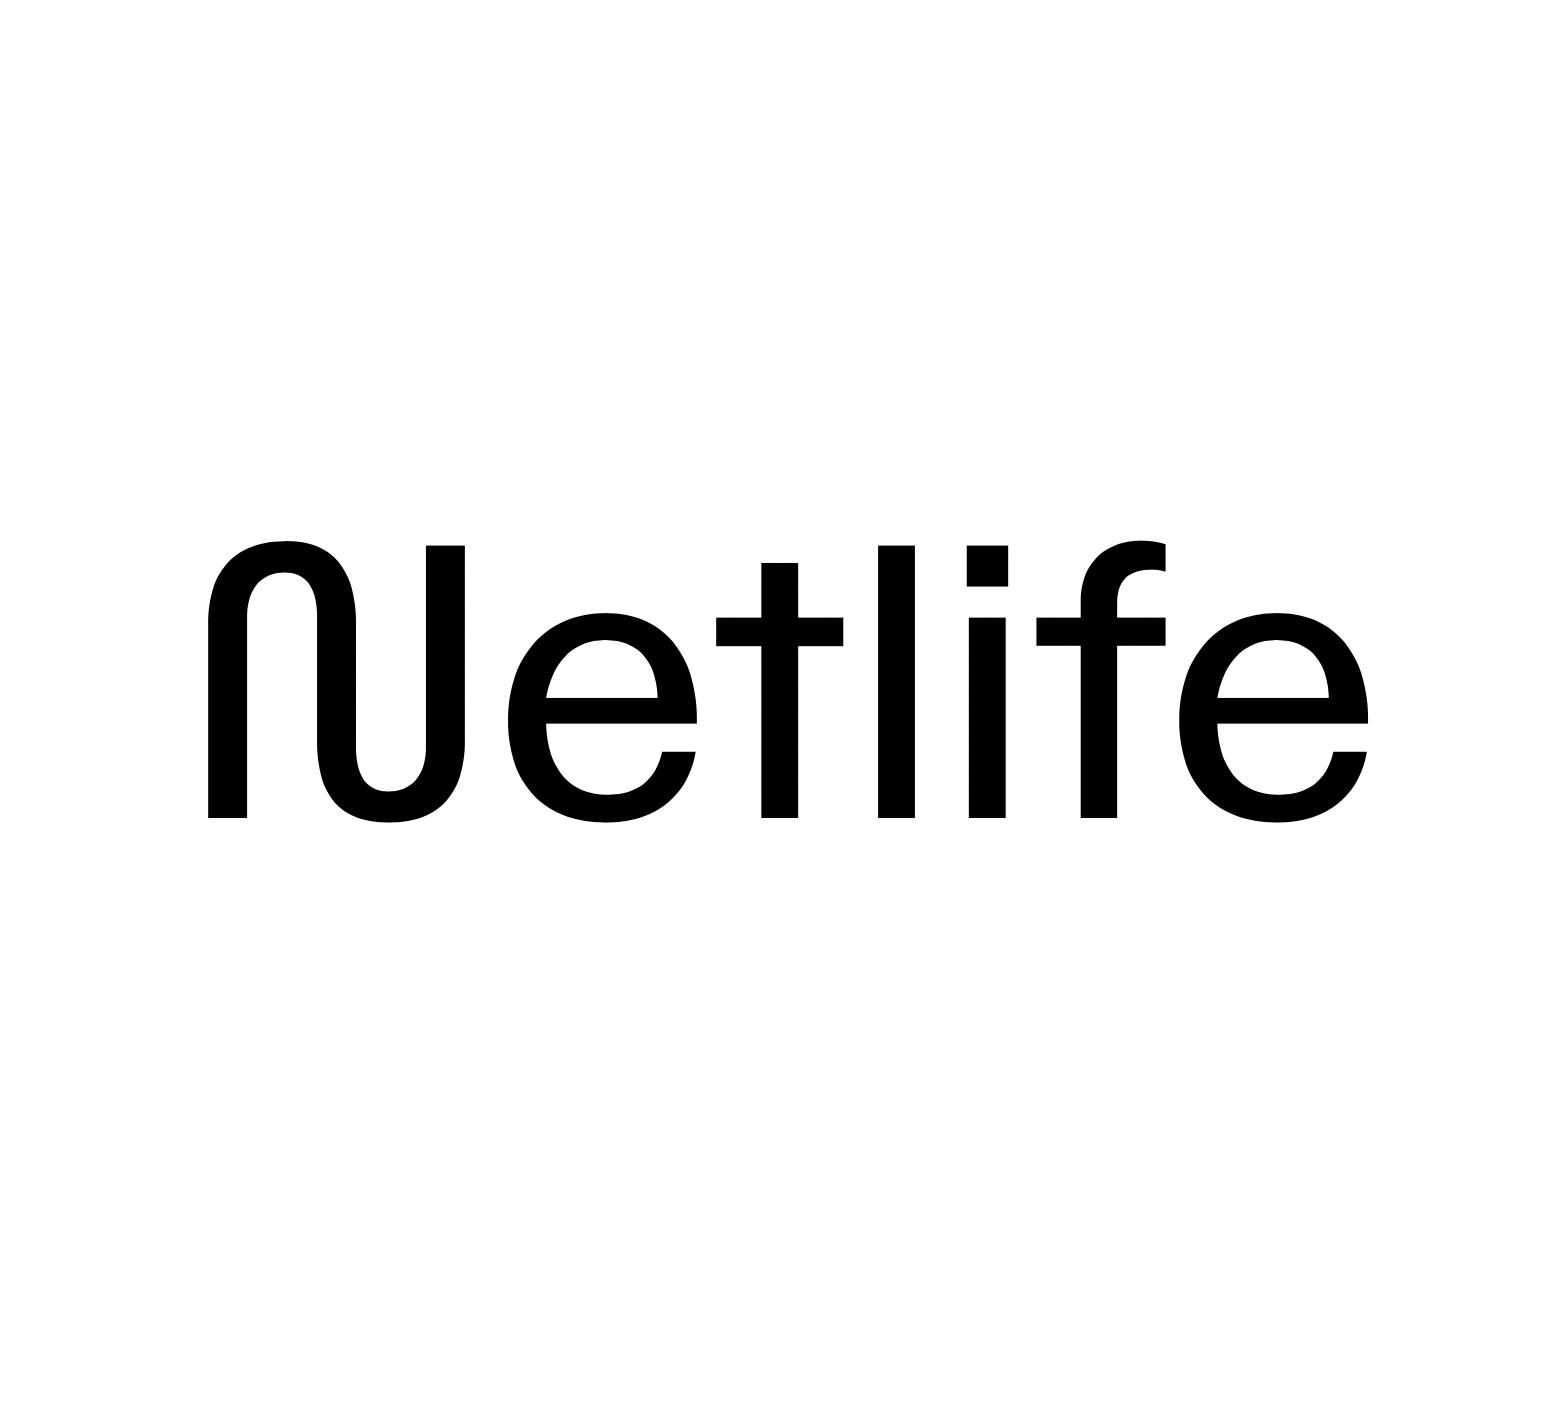 Netlife Design AS